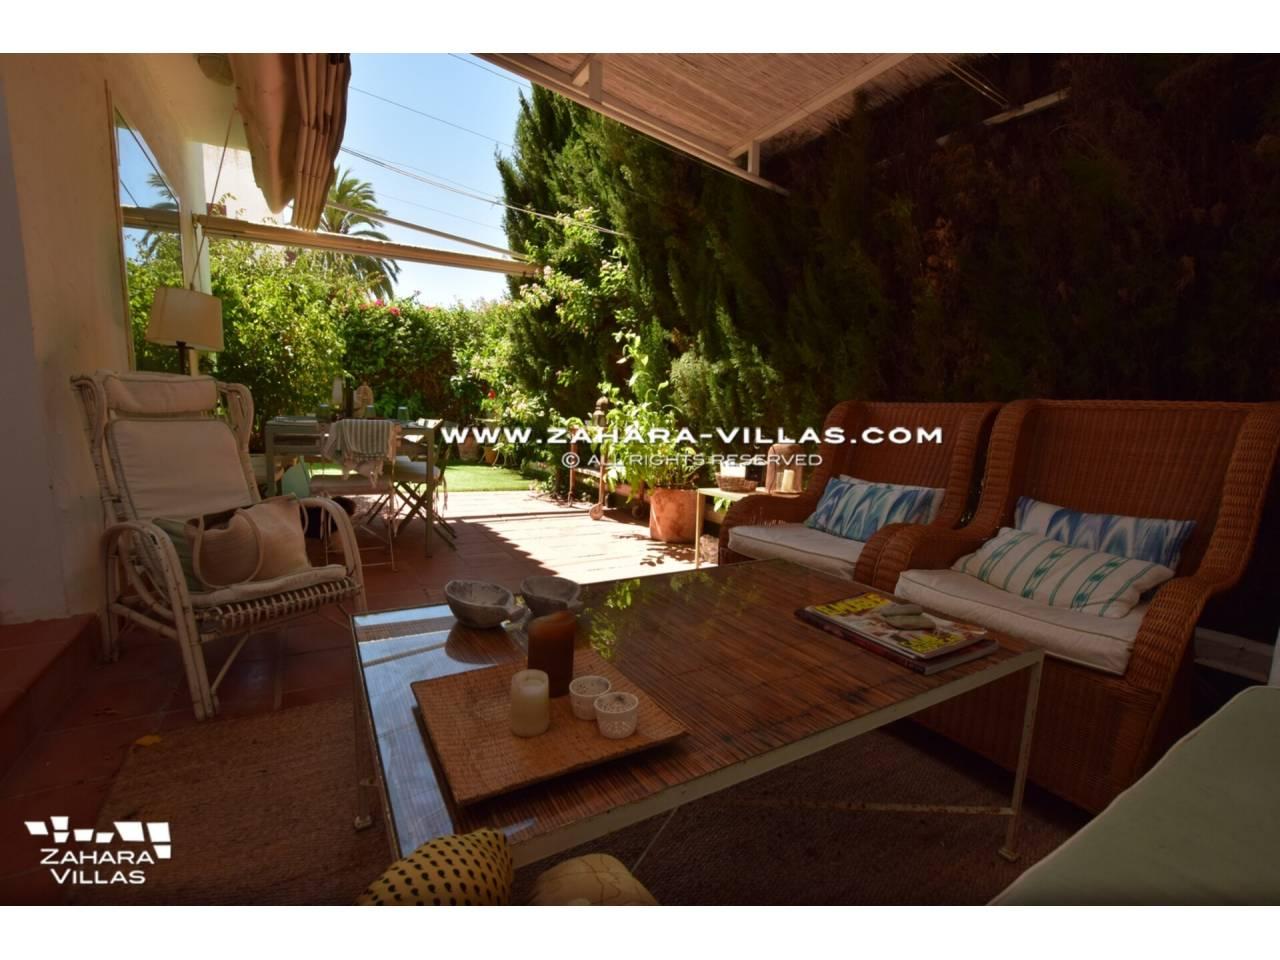 Imagen 3 de House for sale close to the beach, with sea views in Zahara de los Atunes